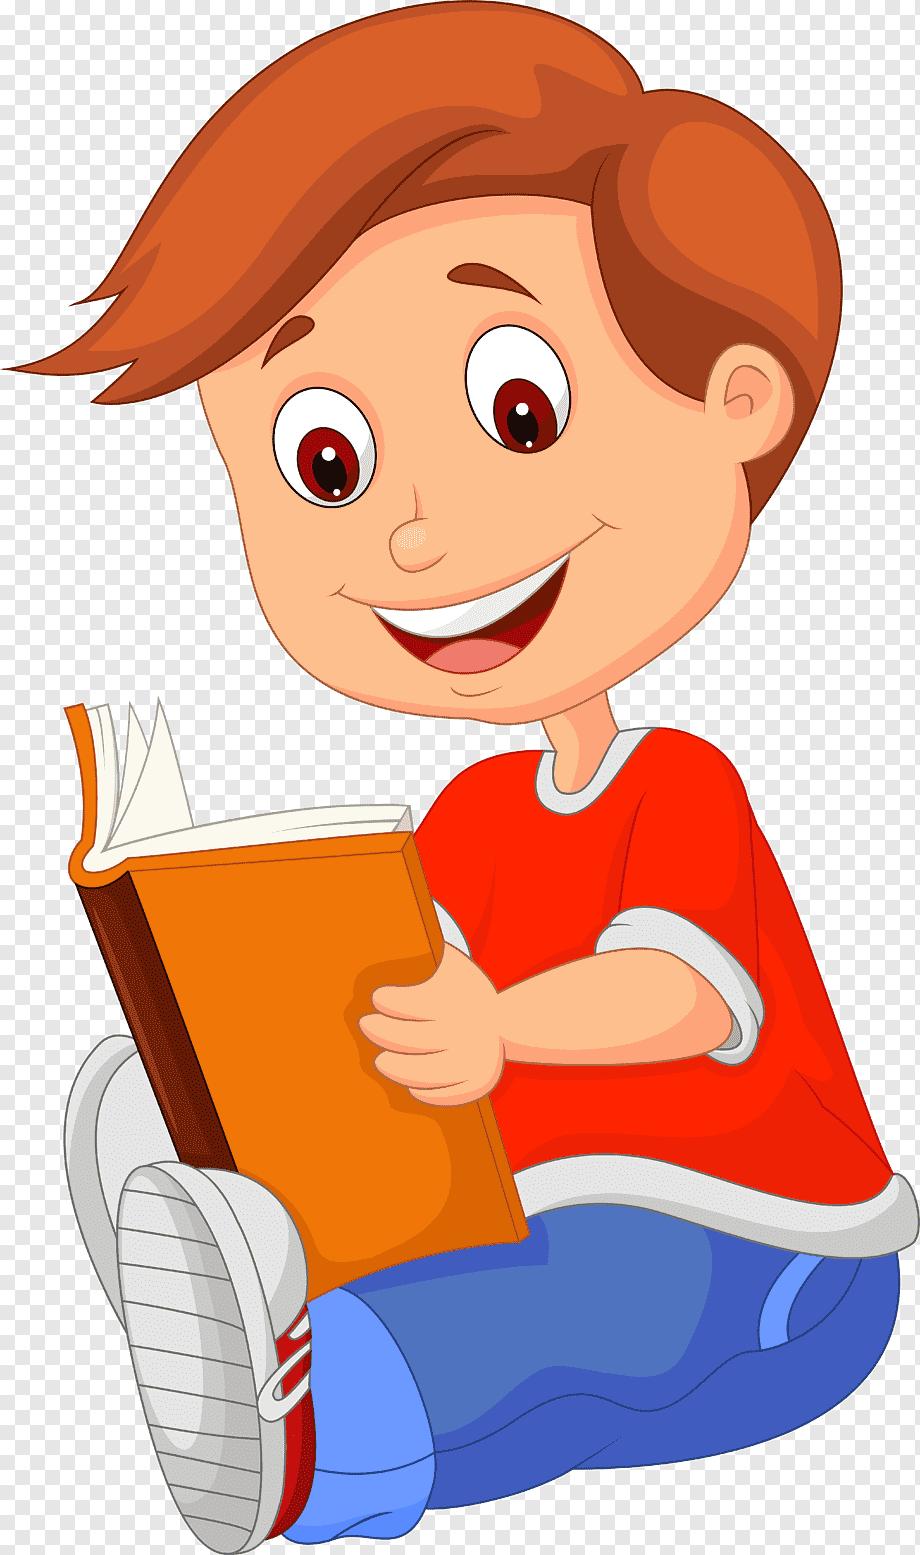 Gambar Buku Kartun Png : gambar, kartun, Cartoon, Reading,, Child,, Hand,, Comic, PNGWing